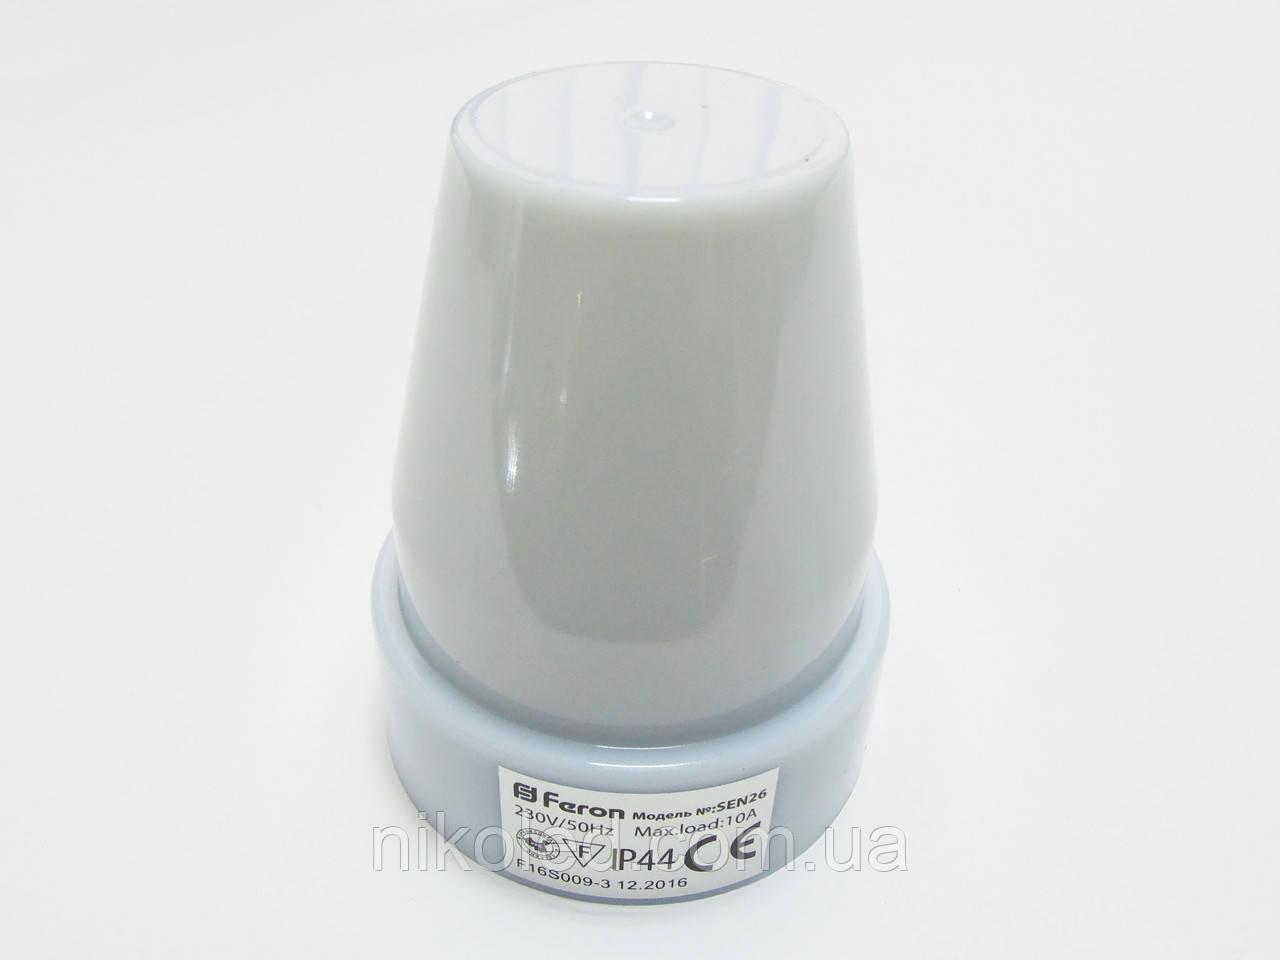 Сумеречное датчик/реле DELUX_ST302 10А 2-100Лк белый